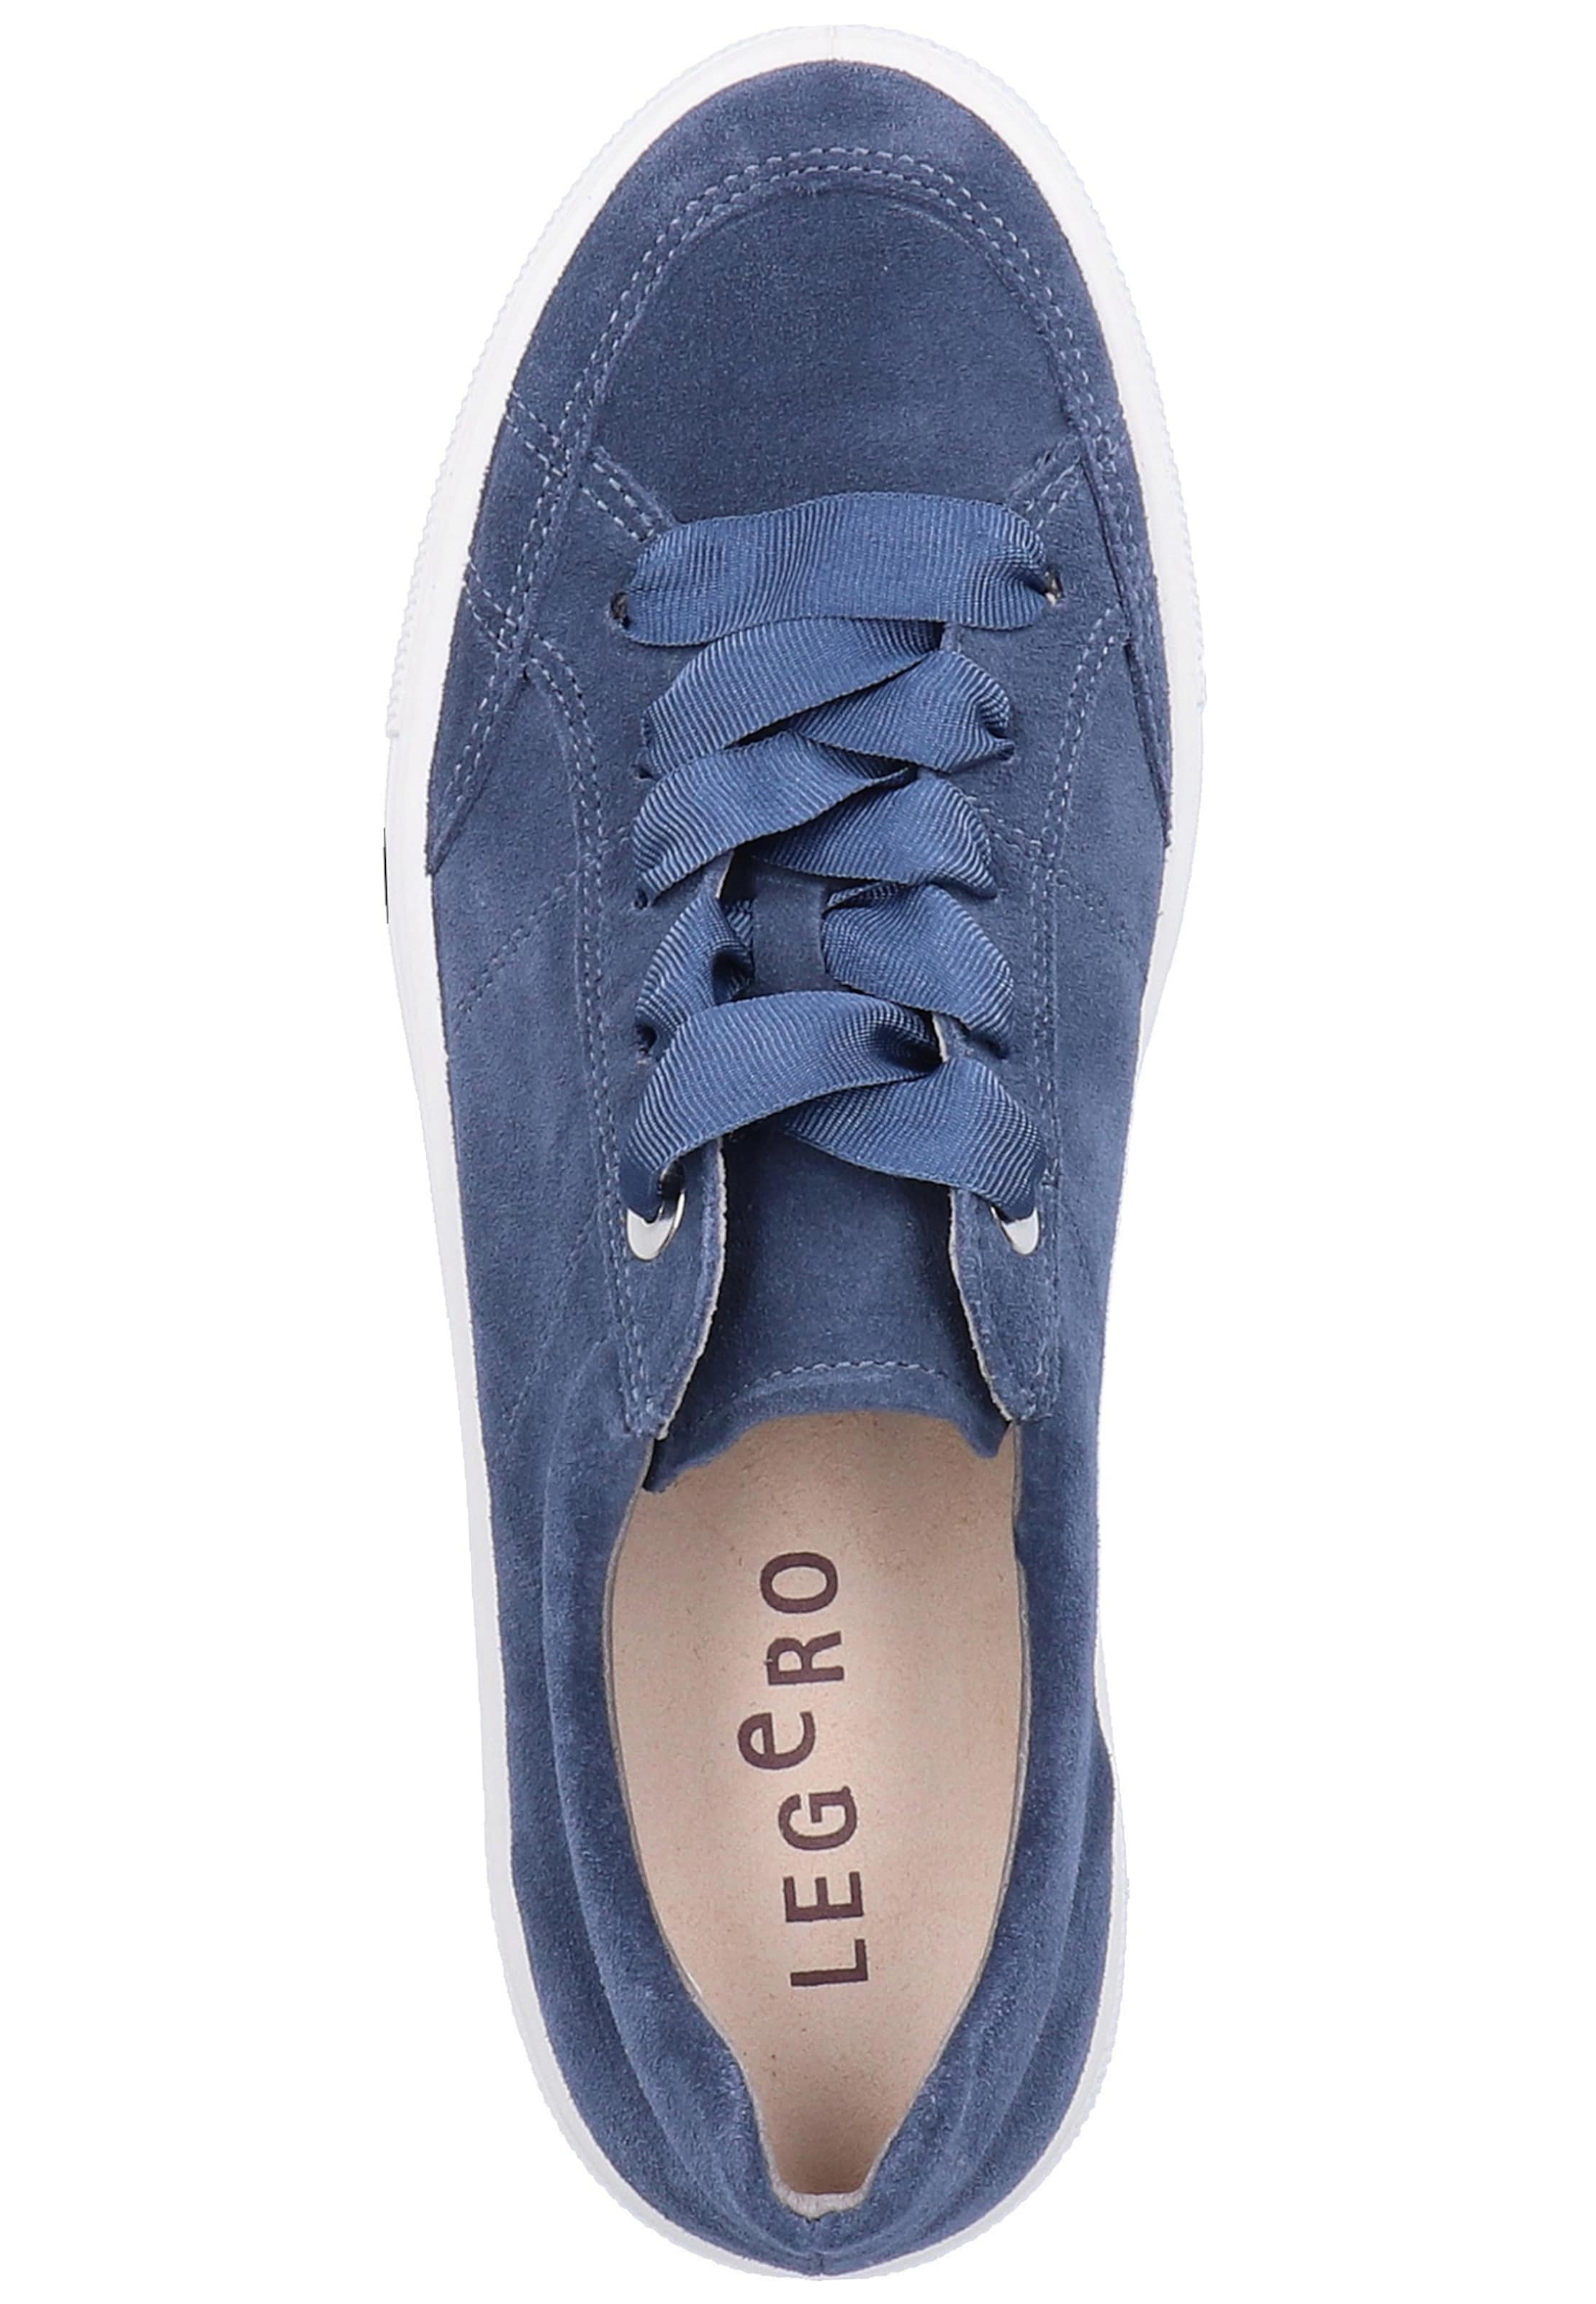 En Basses Bleu Legero Baskets dCxoWeBr